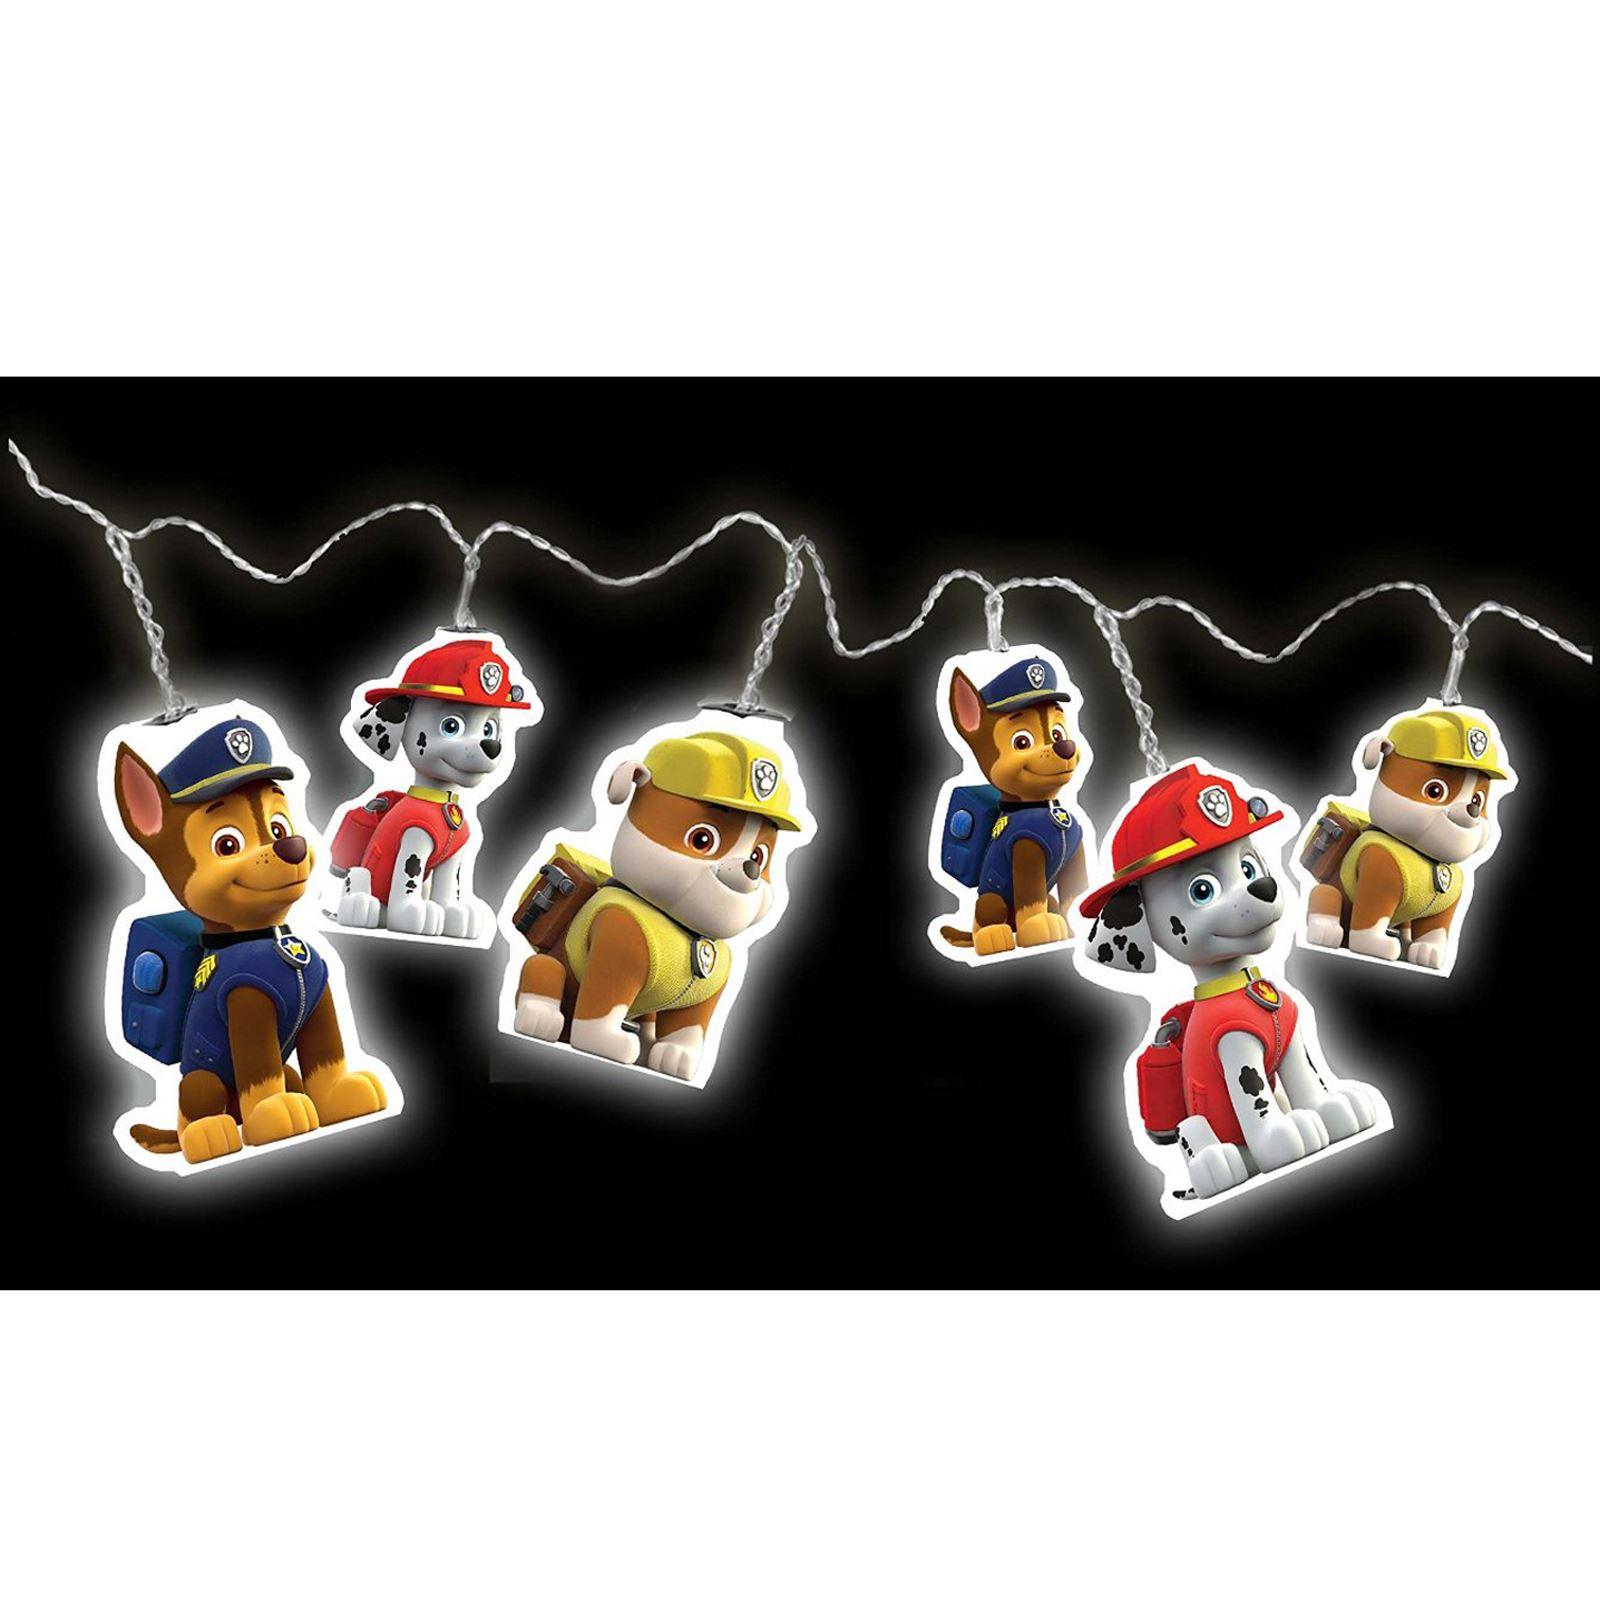 PAW PATROL LED STRING LIGHTS NEW KIDS NIGHT MOOD LIGHTING eBay